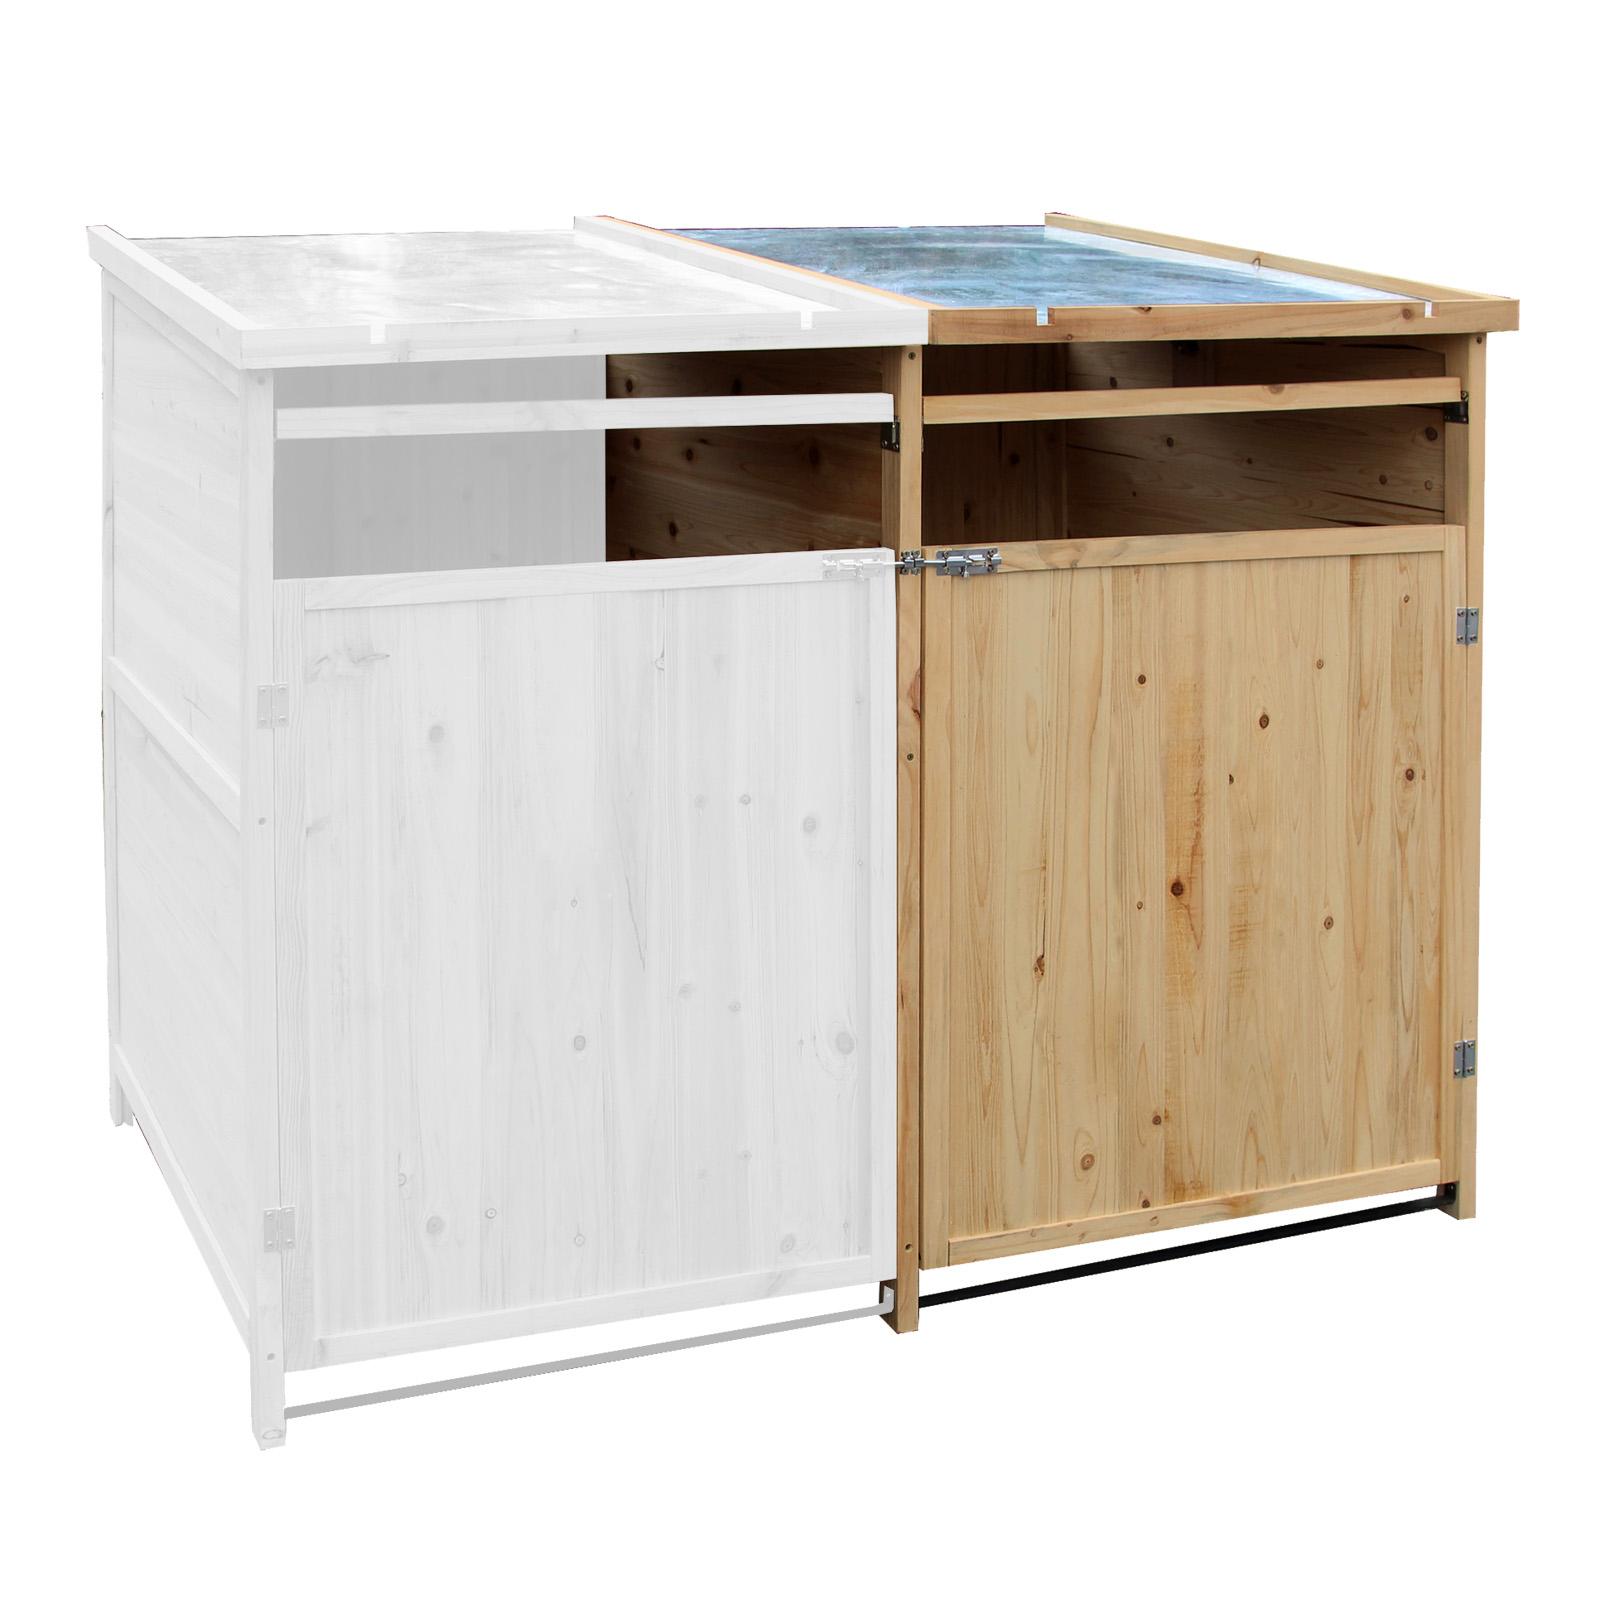 m lltonnenbox holz 240 l gartenbox m lltonnenverkleidung m lltonne ebay. Black Bedroom Furniture Sets. Home Design Ideas